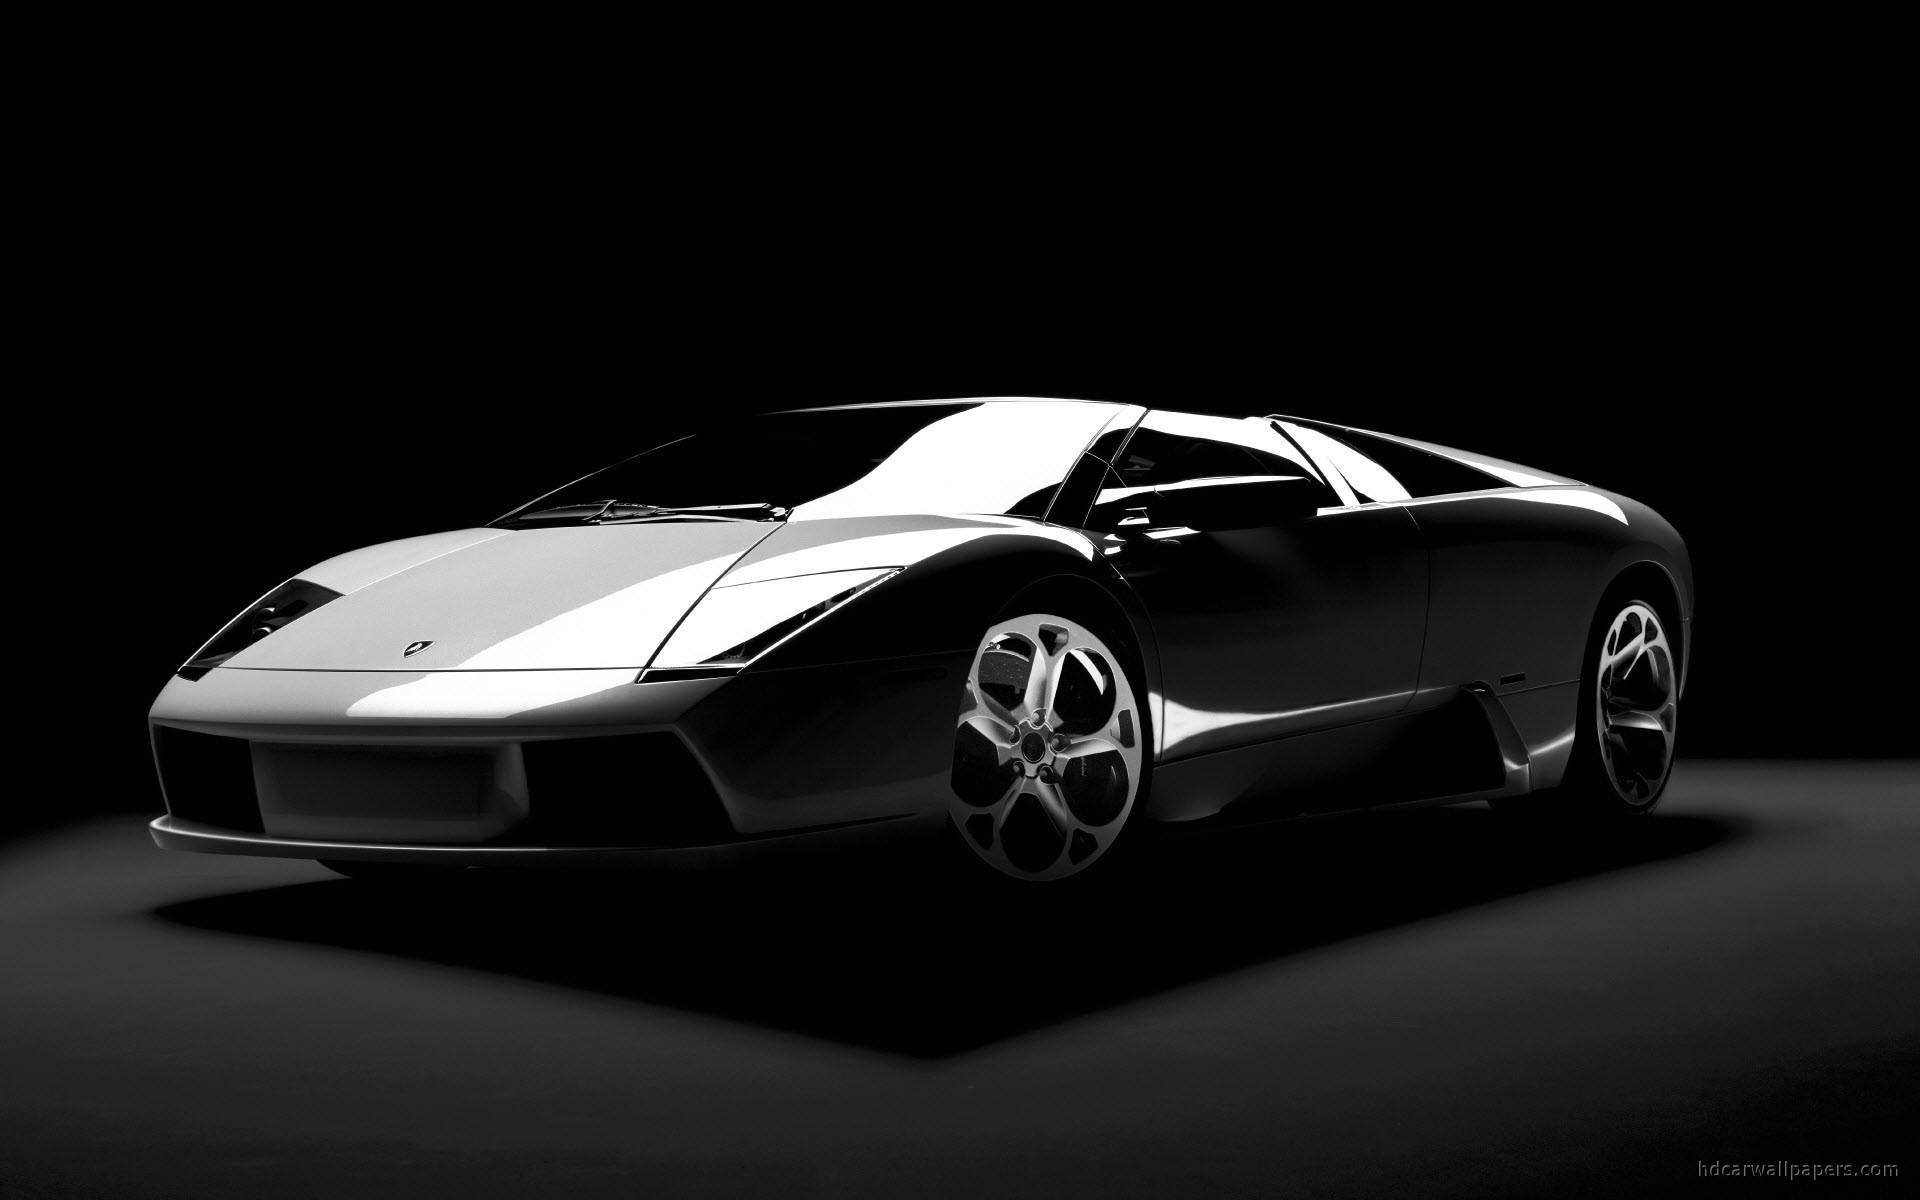 Lamborghini All New Wallpaper   HD Car Wallpapers   ID #857